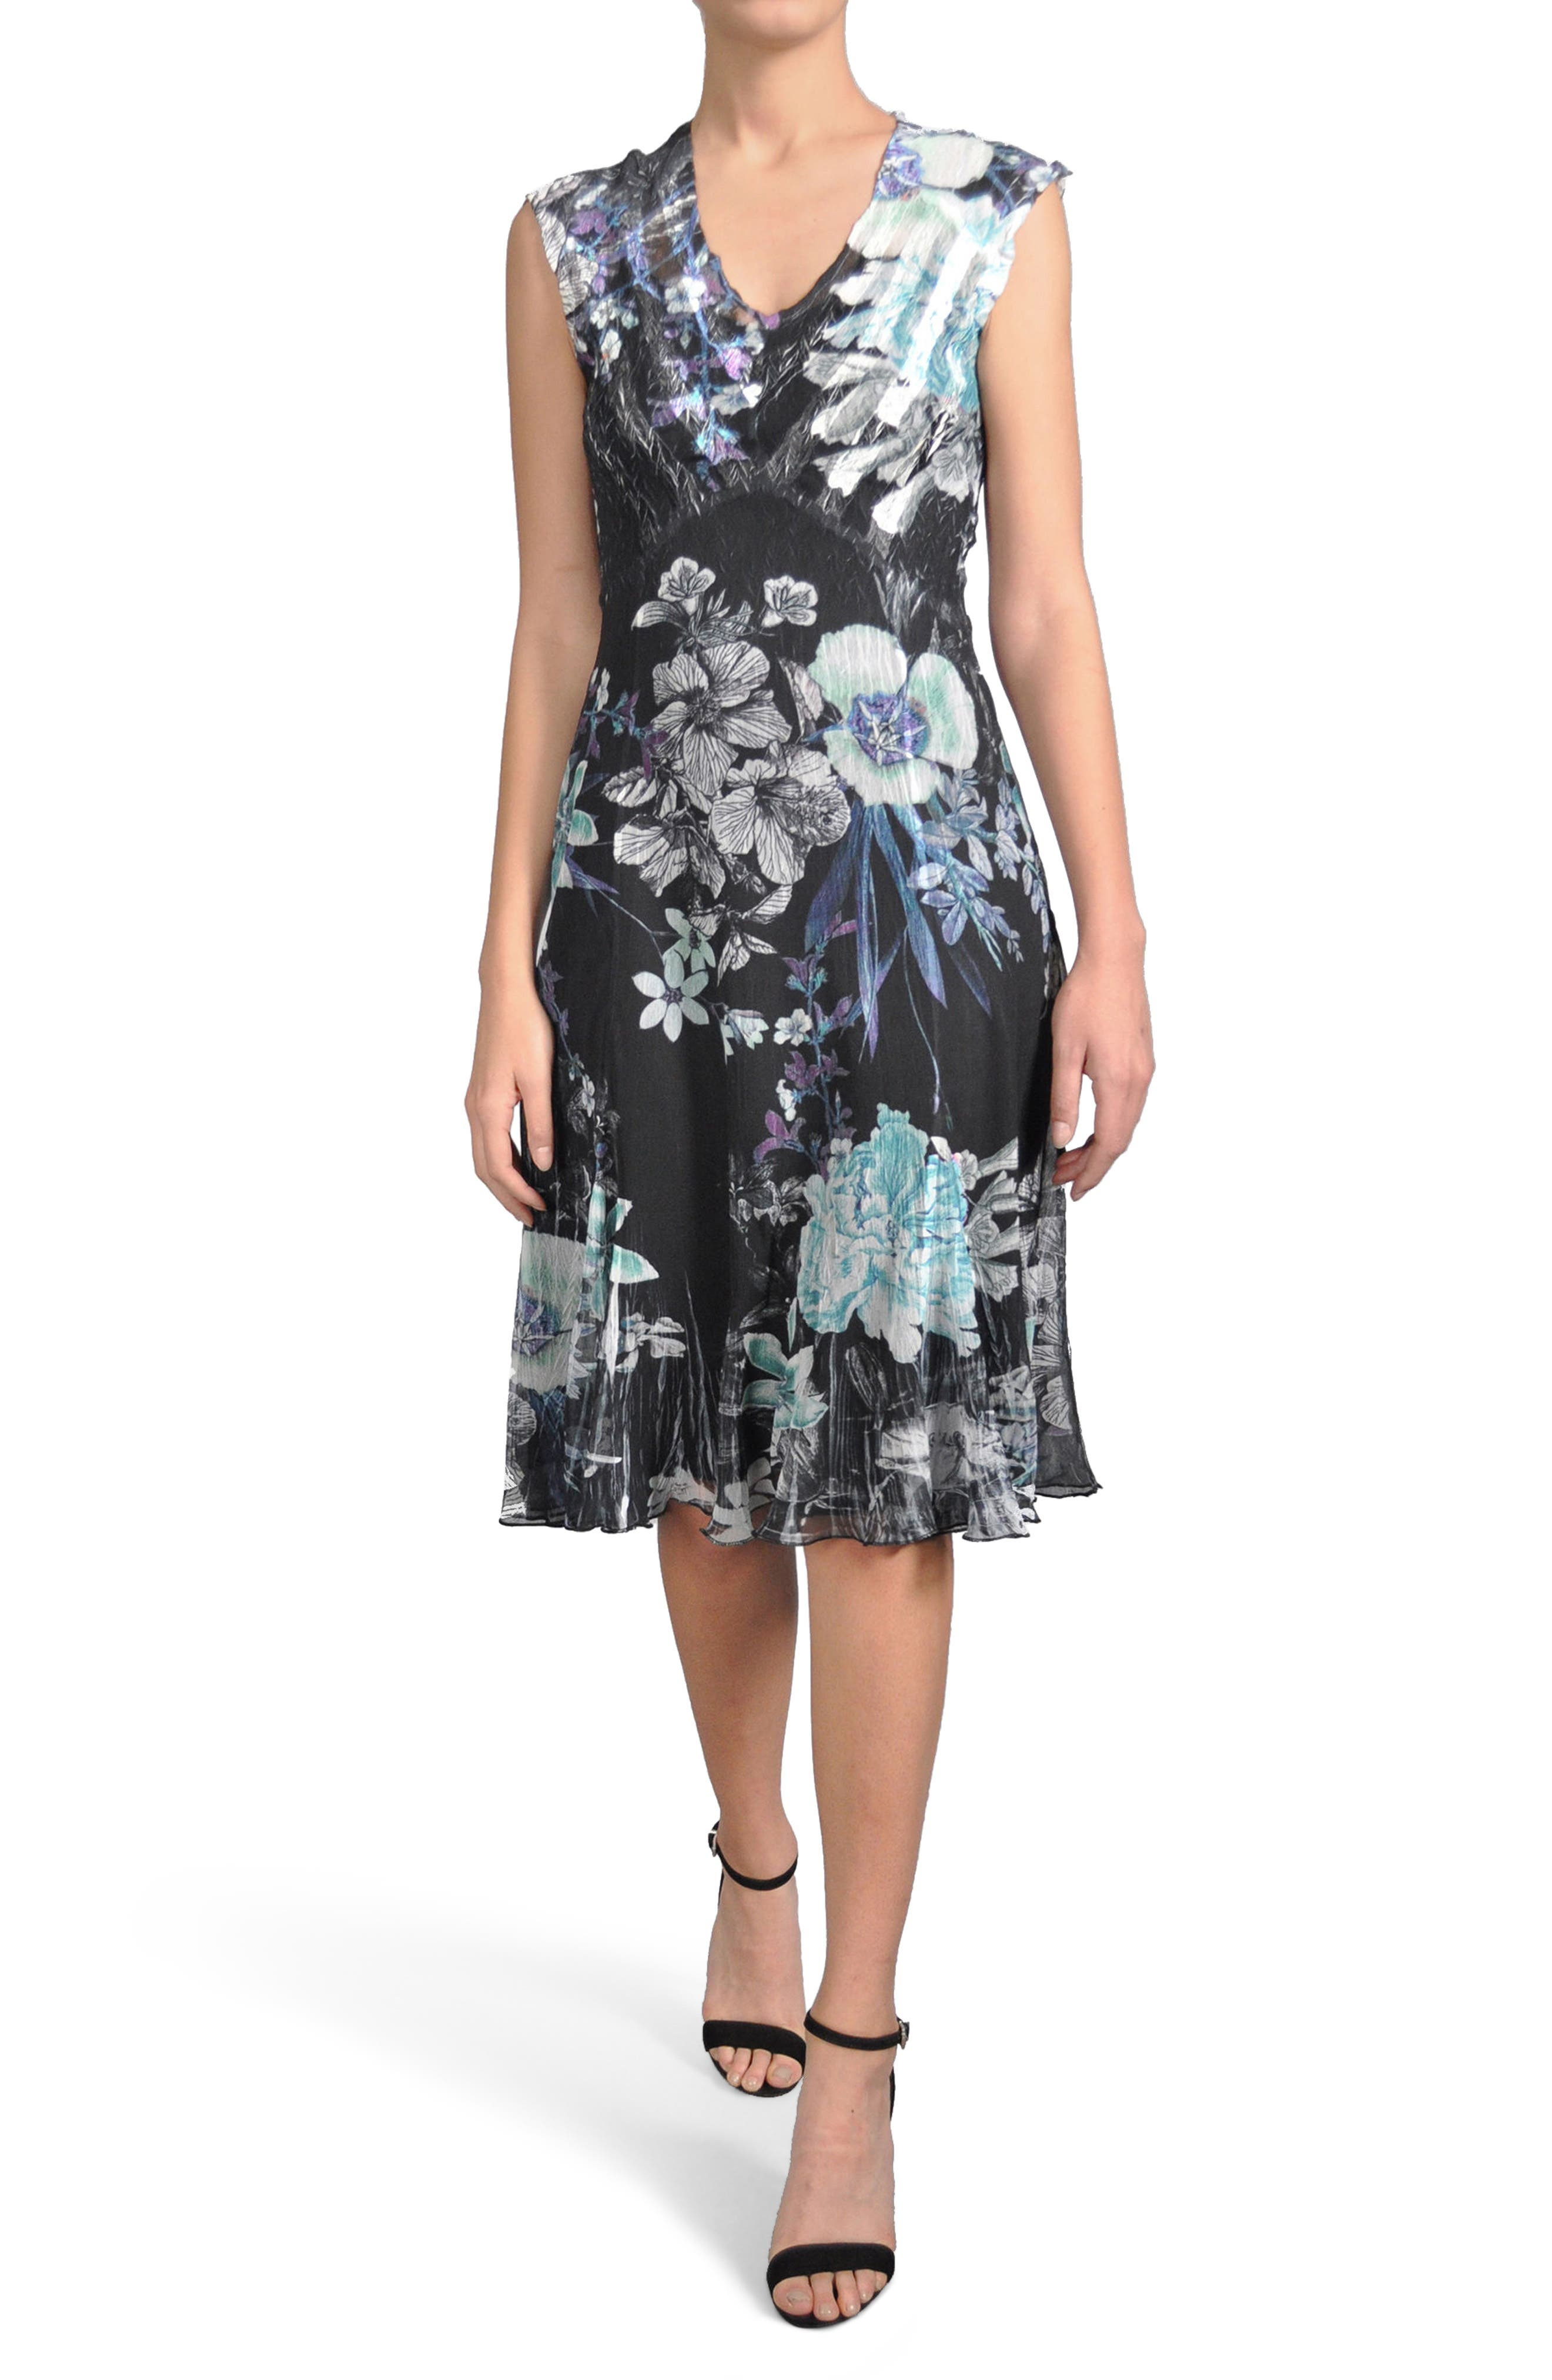 Alternate Image 1 Selected - Komarov Print Chiffon Dress (Regular & Petite)